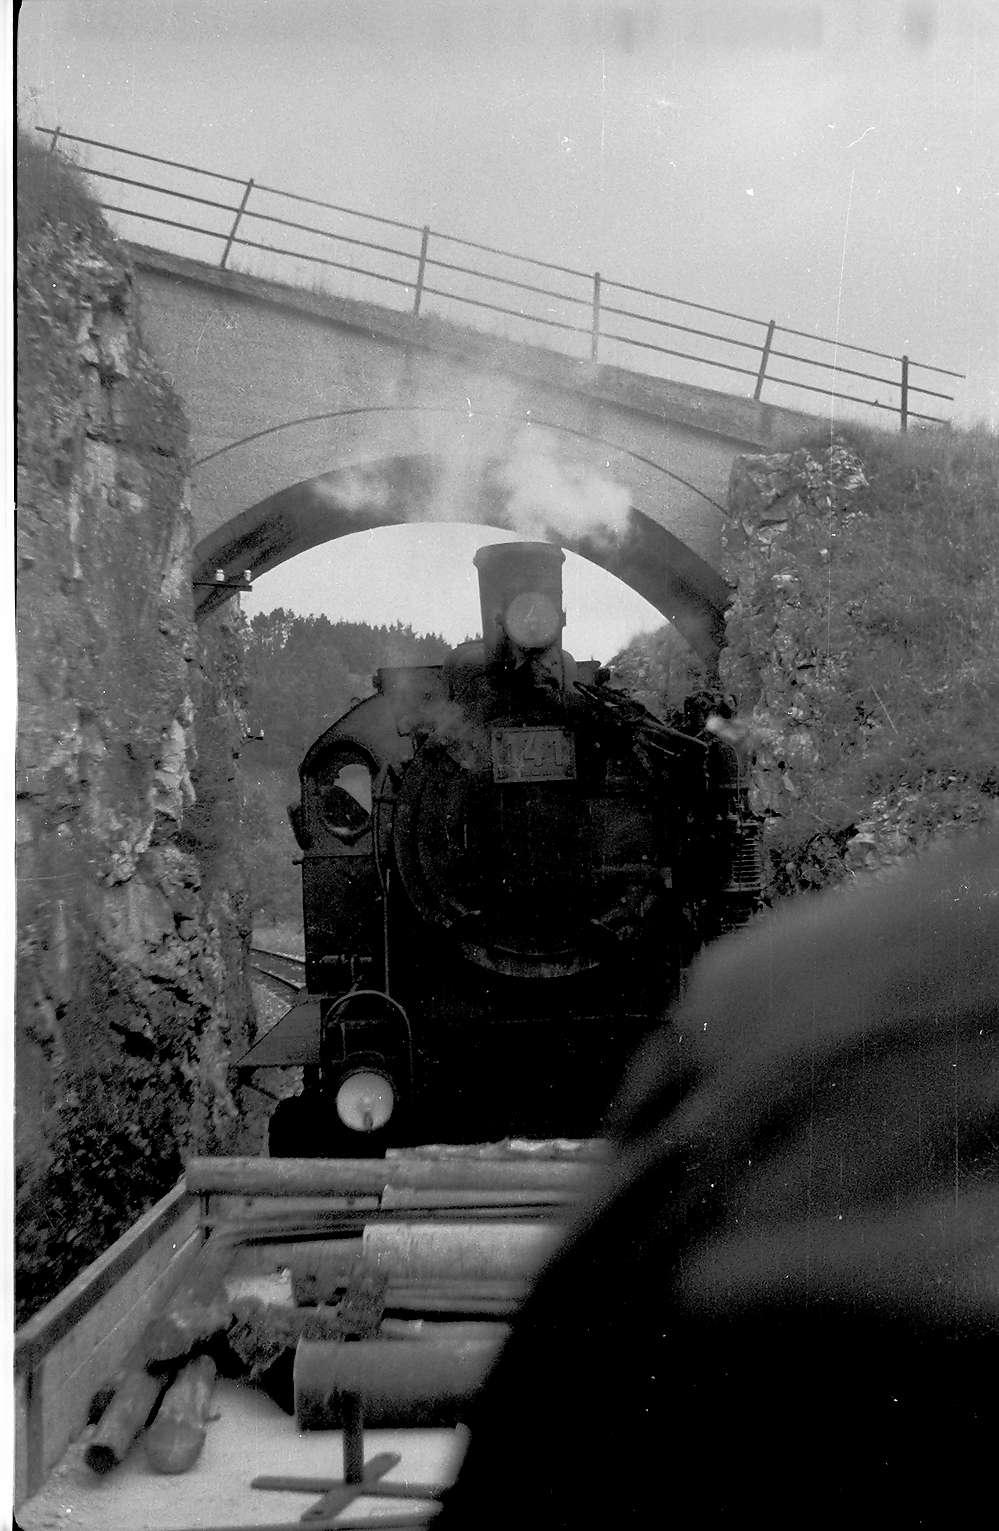 Lok 141, Az 419/20, Veringendorf - Veringenstadt, Feldwegbrücke erbaut 1908, 2009 noch vorhanden, Bild 1